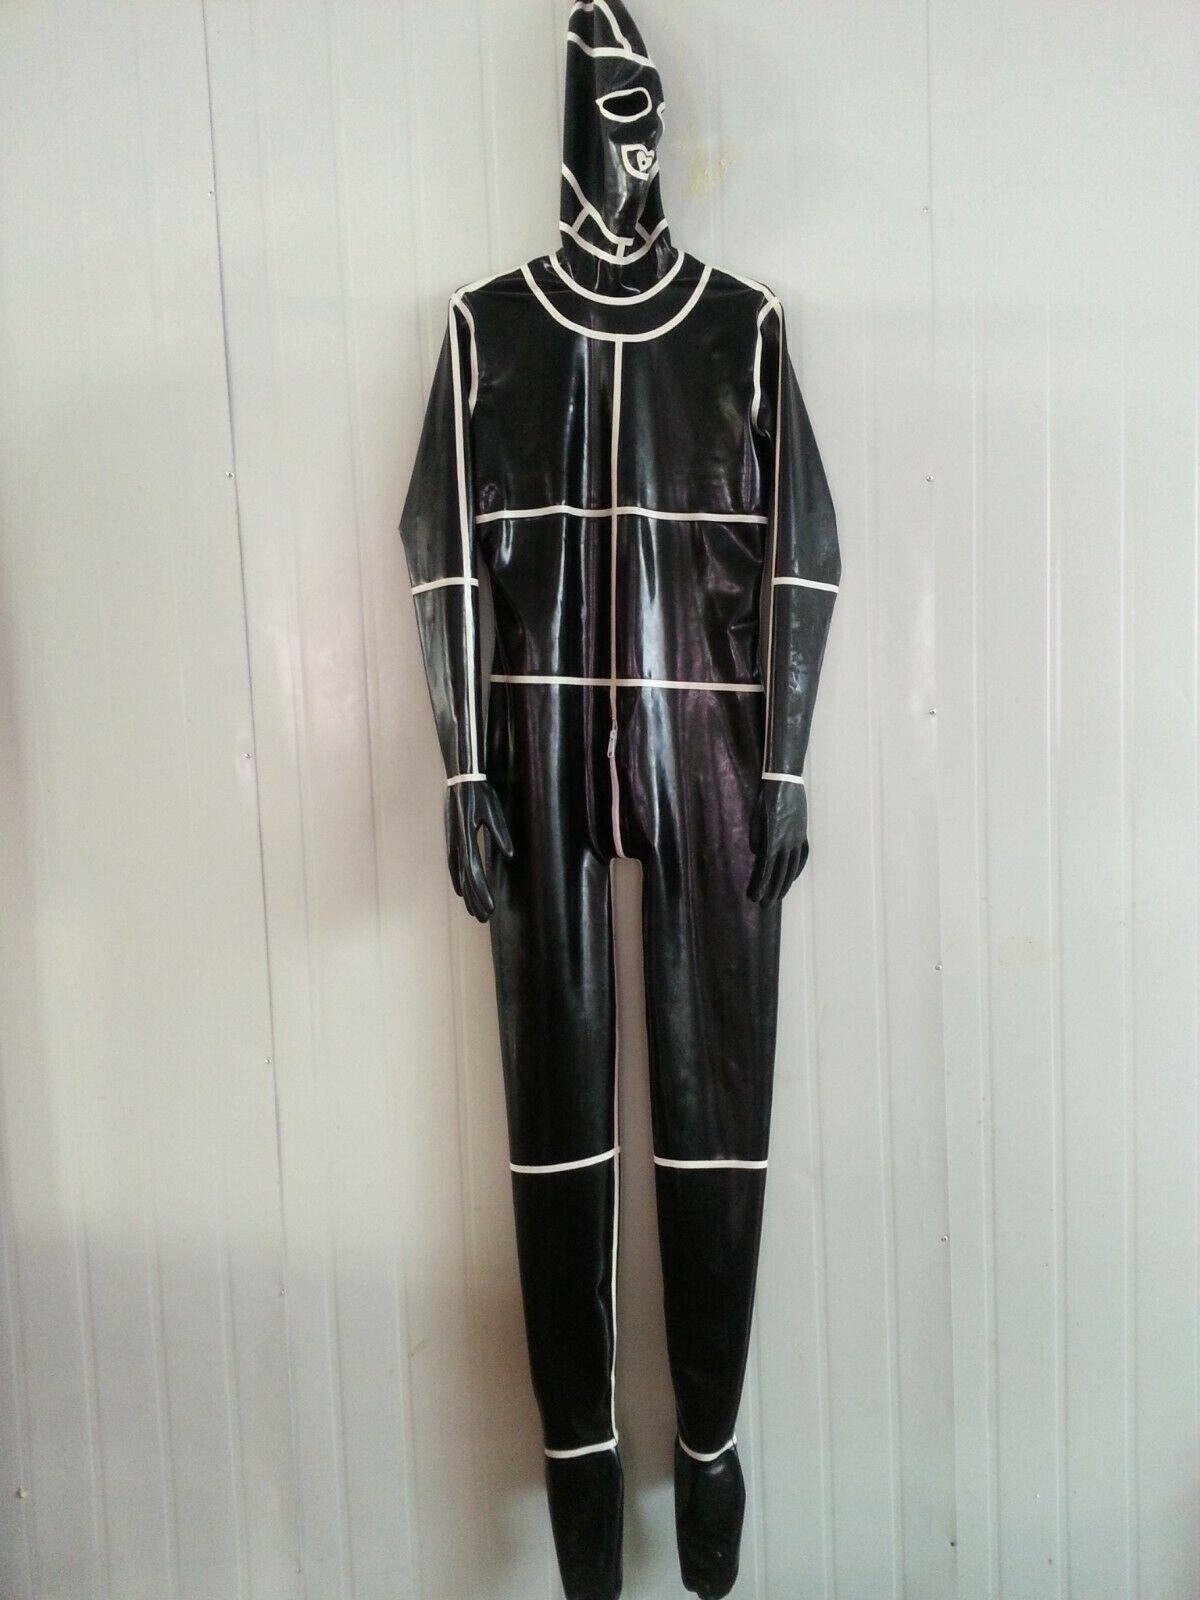 100% Latex caoutchouc mode body Spiderman uniforme costumes masque Ganzanzug Catsuit0.4mmS-XXL